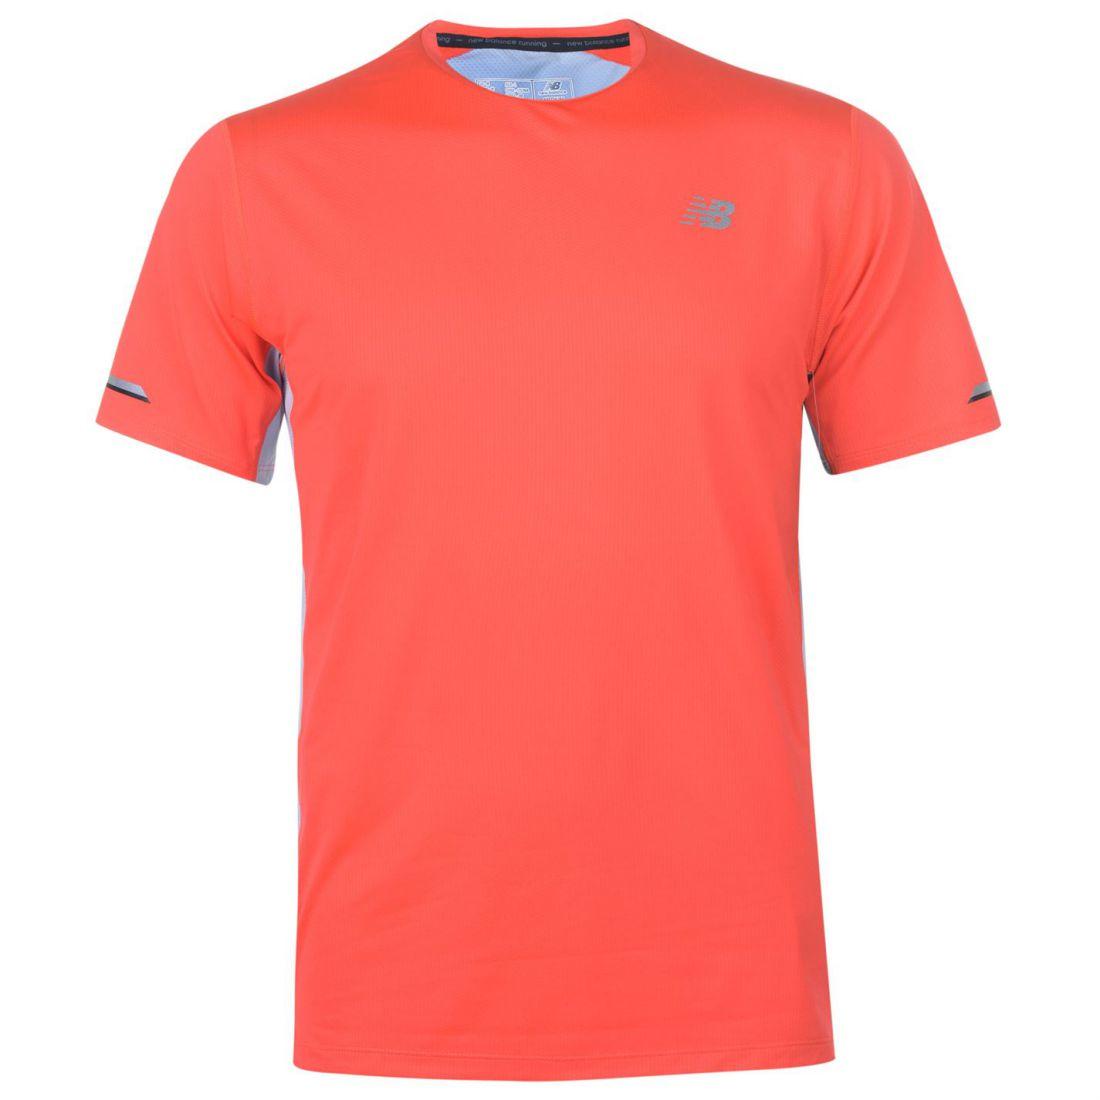 b7e258458bae9 Details about New Balance Mens Ice Running Tee Short Sleeve Performance  Shirt Crew Neck Quick